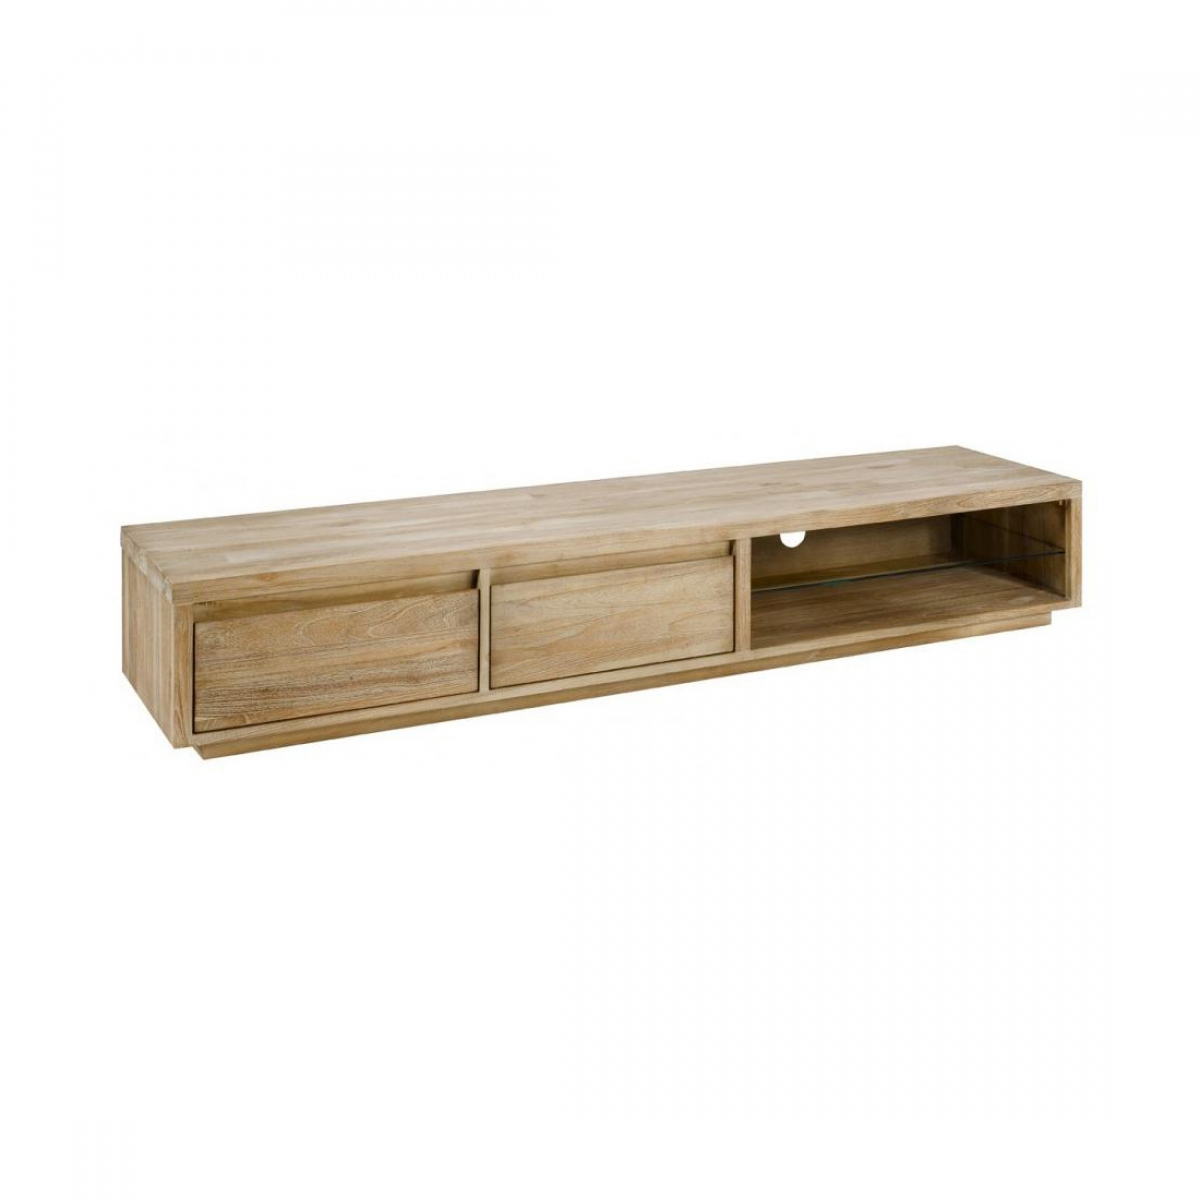 zago meuble tv teck lin 2 niches 2 tiroirs cosmopolitan. Black Bedroom Furniture Sets. Home Design Ideas